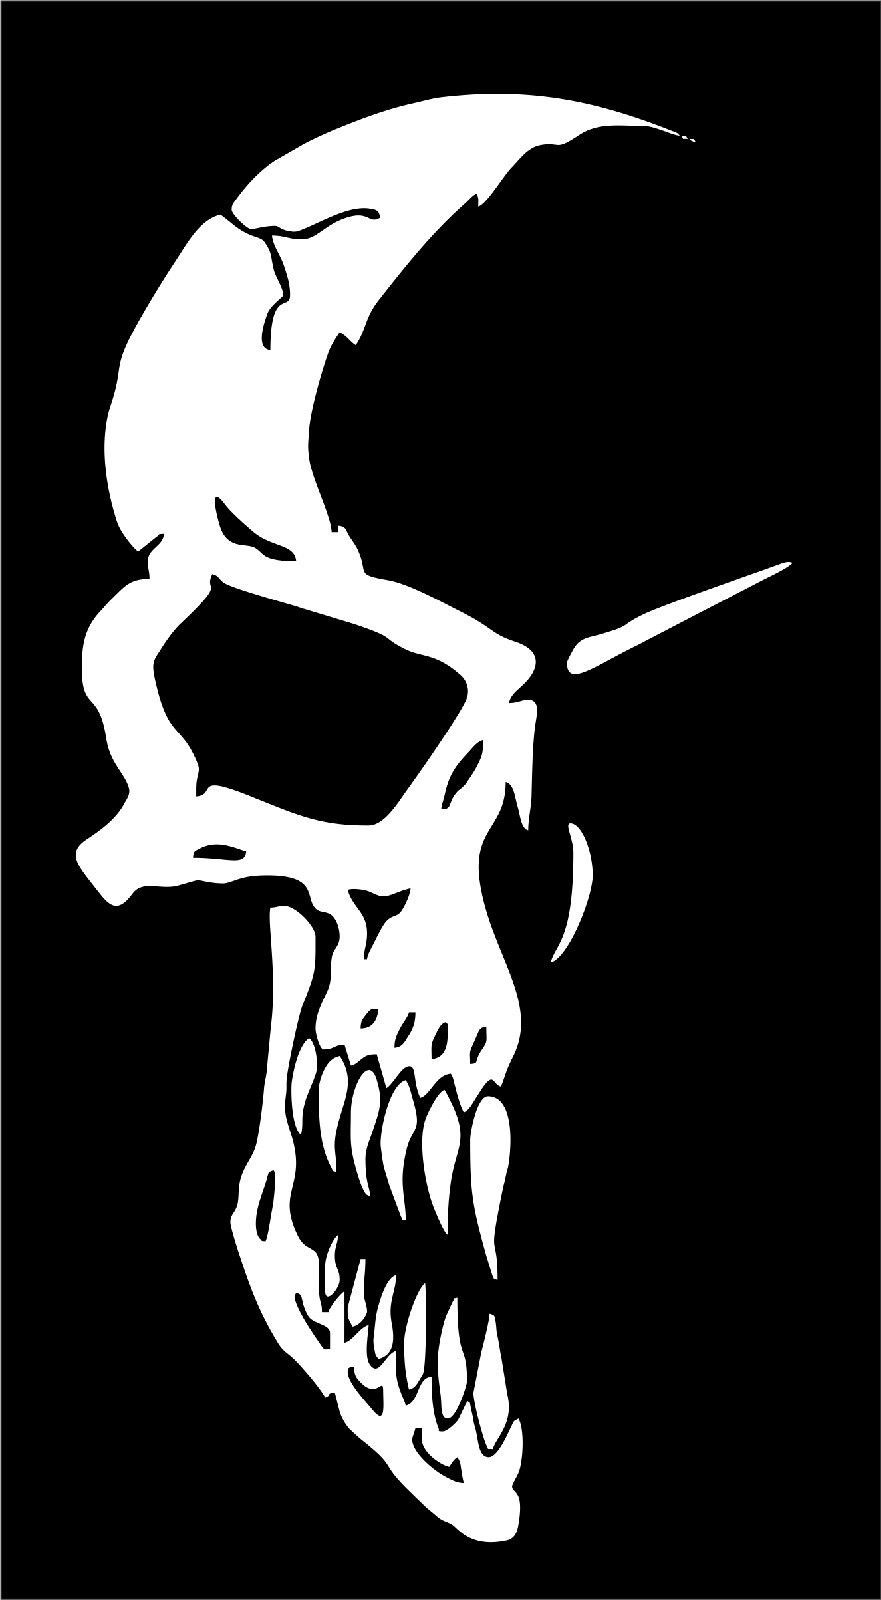 Half skull face mask car truck window laptop vinyl tattoo decal sticker